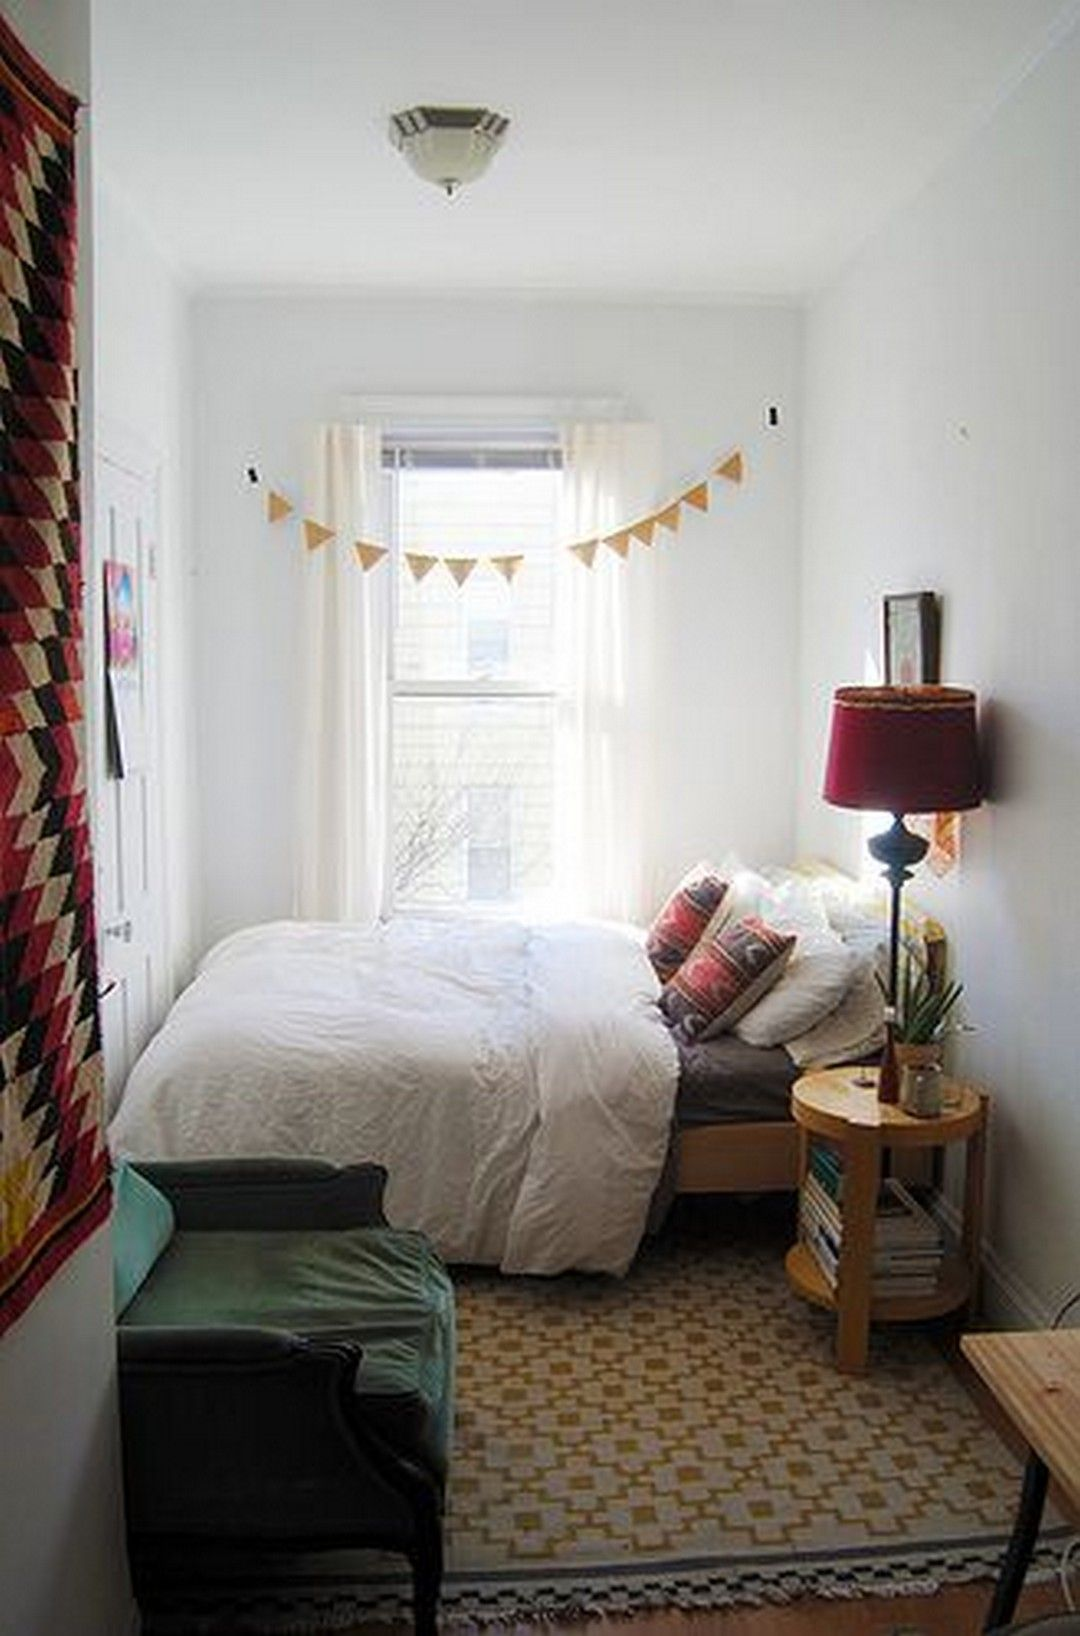 92 Elegant Cozy Bedroom Ideas with Small Spaces | Bedroom ...